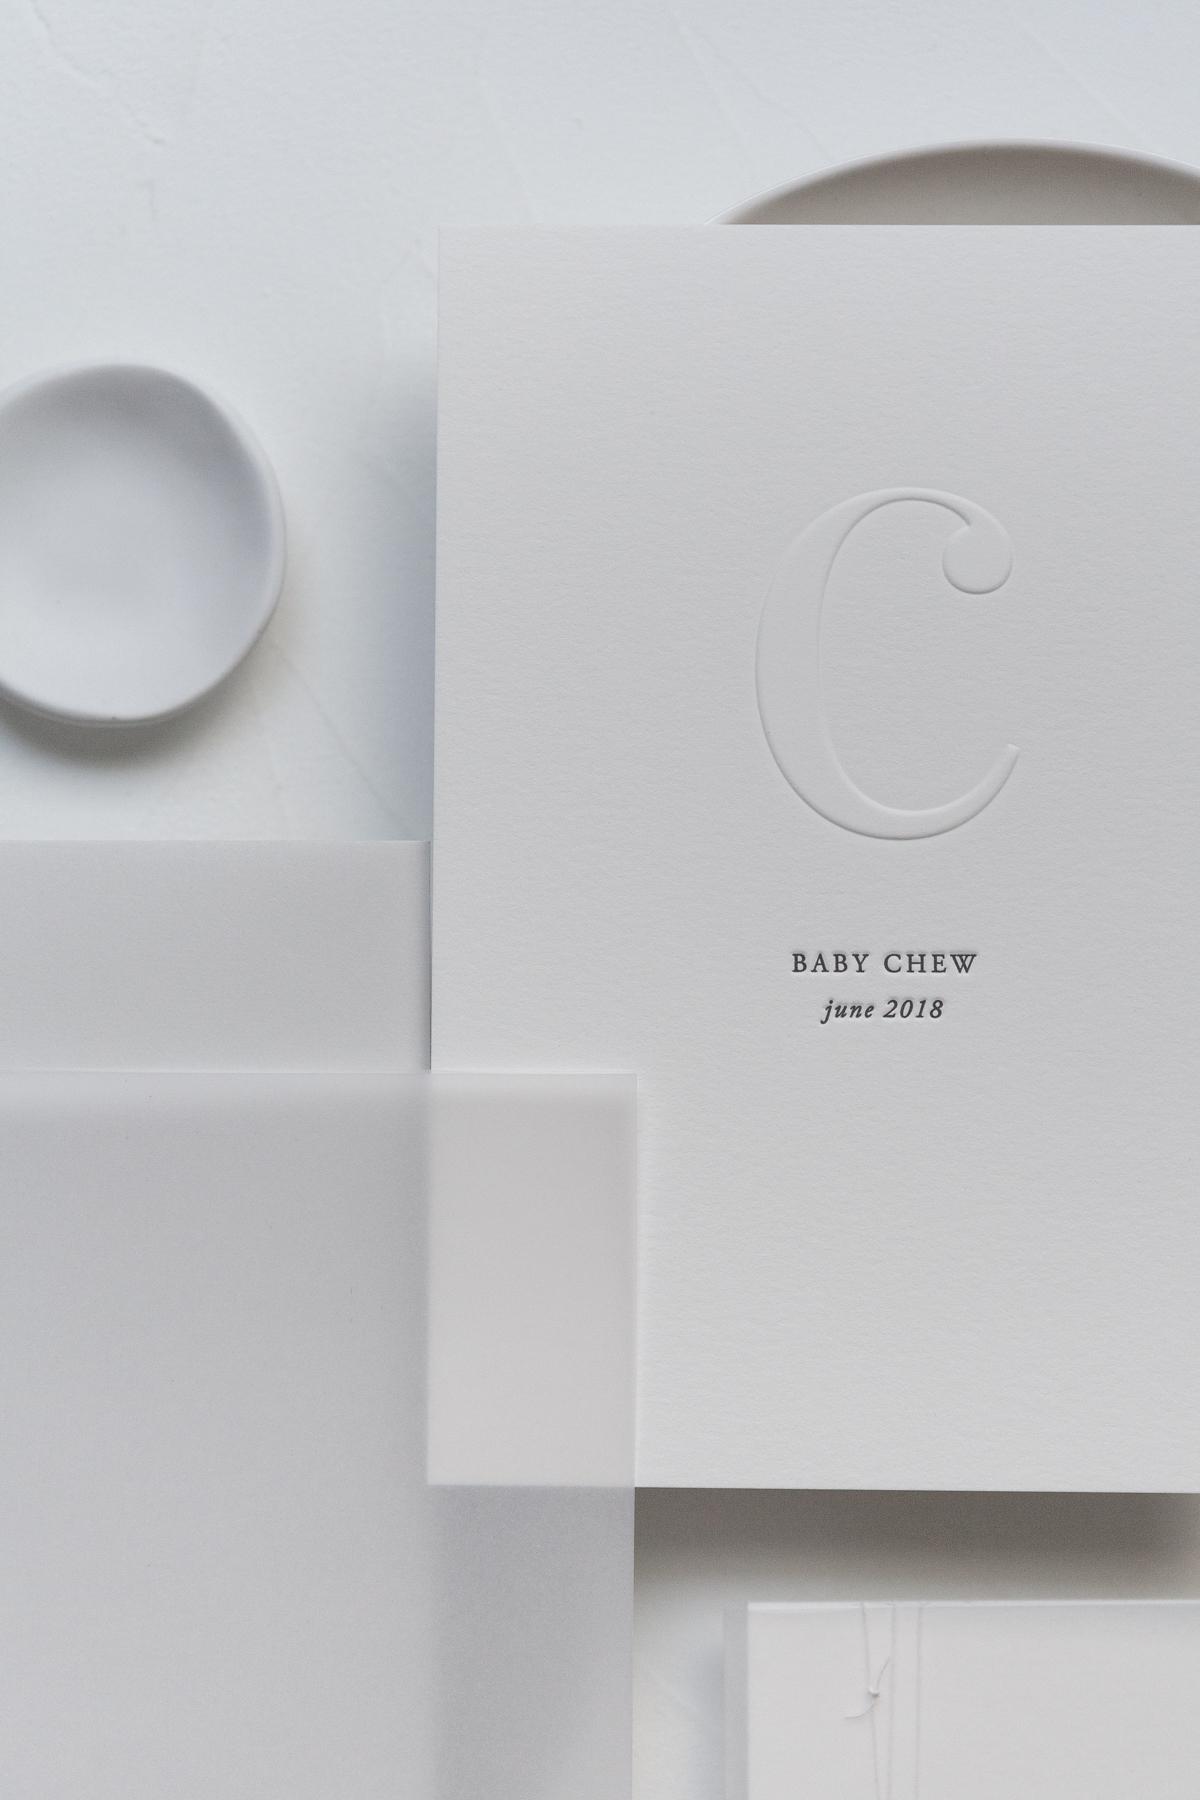 Baby Chew Gender Reveal Invites-12.jpg